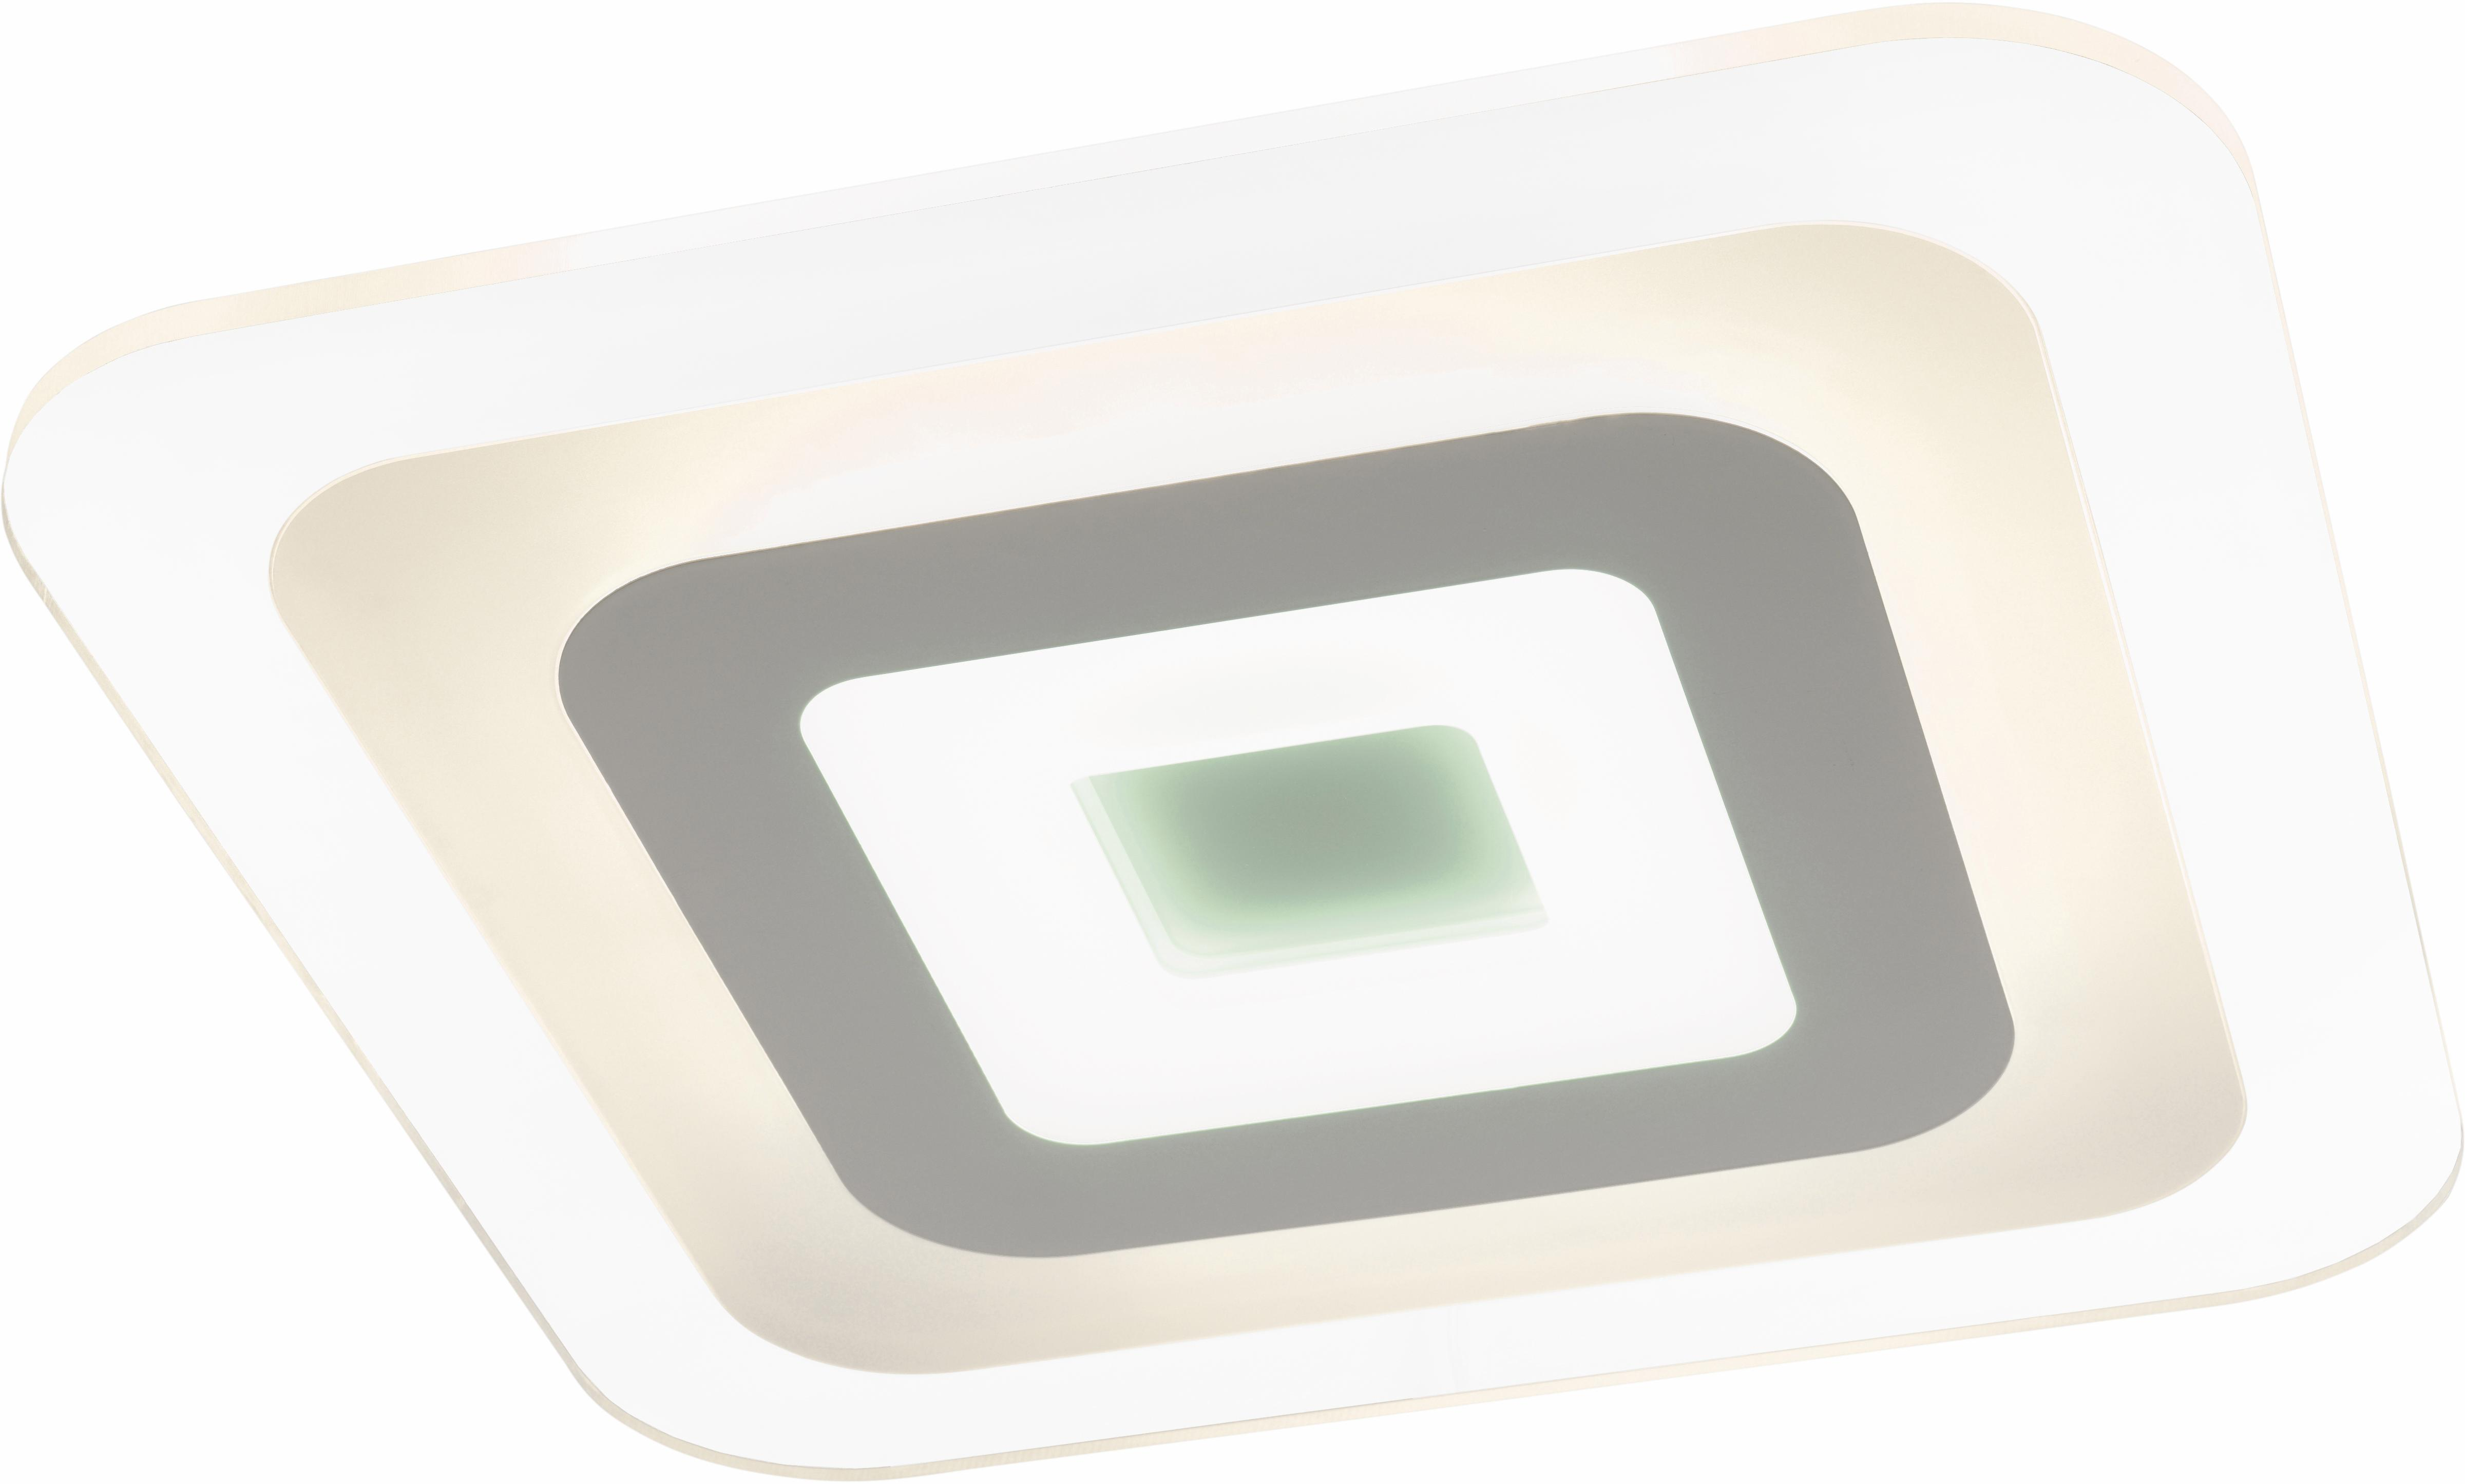 EGLO,LED Deckenleuchte REDUCTA 1